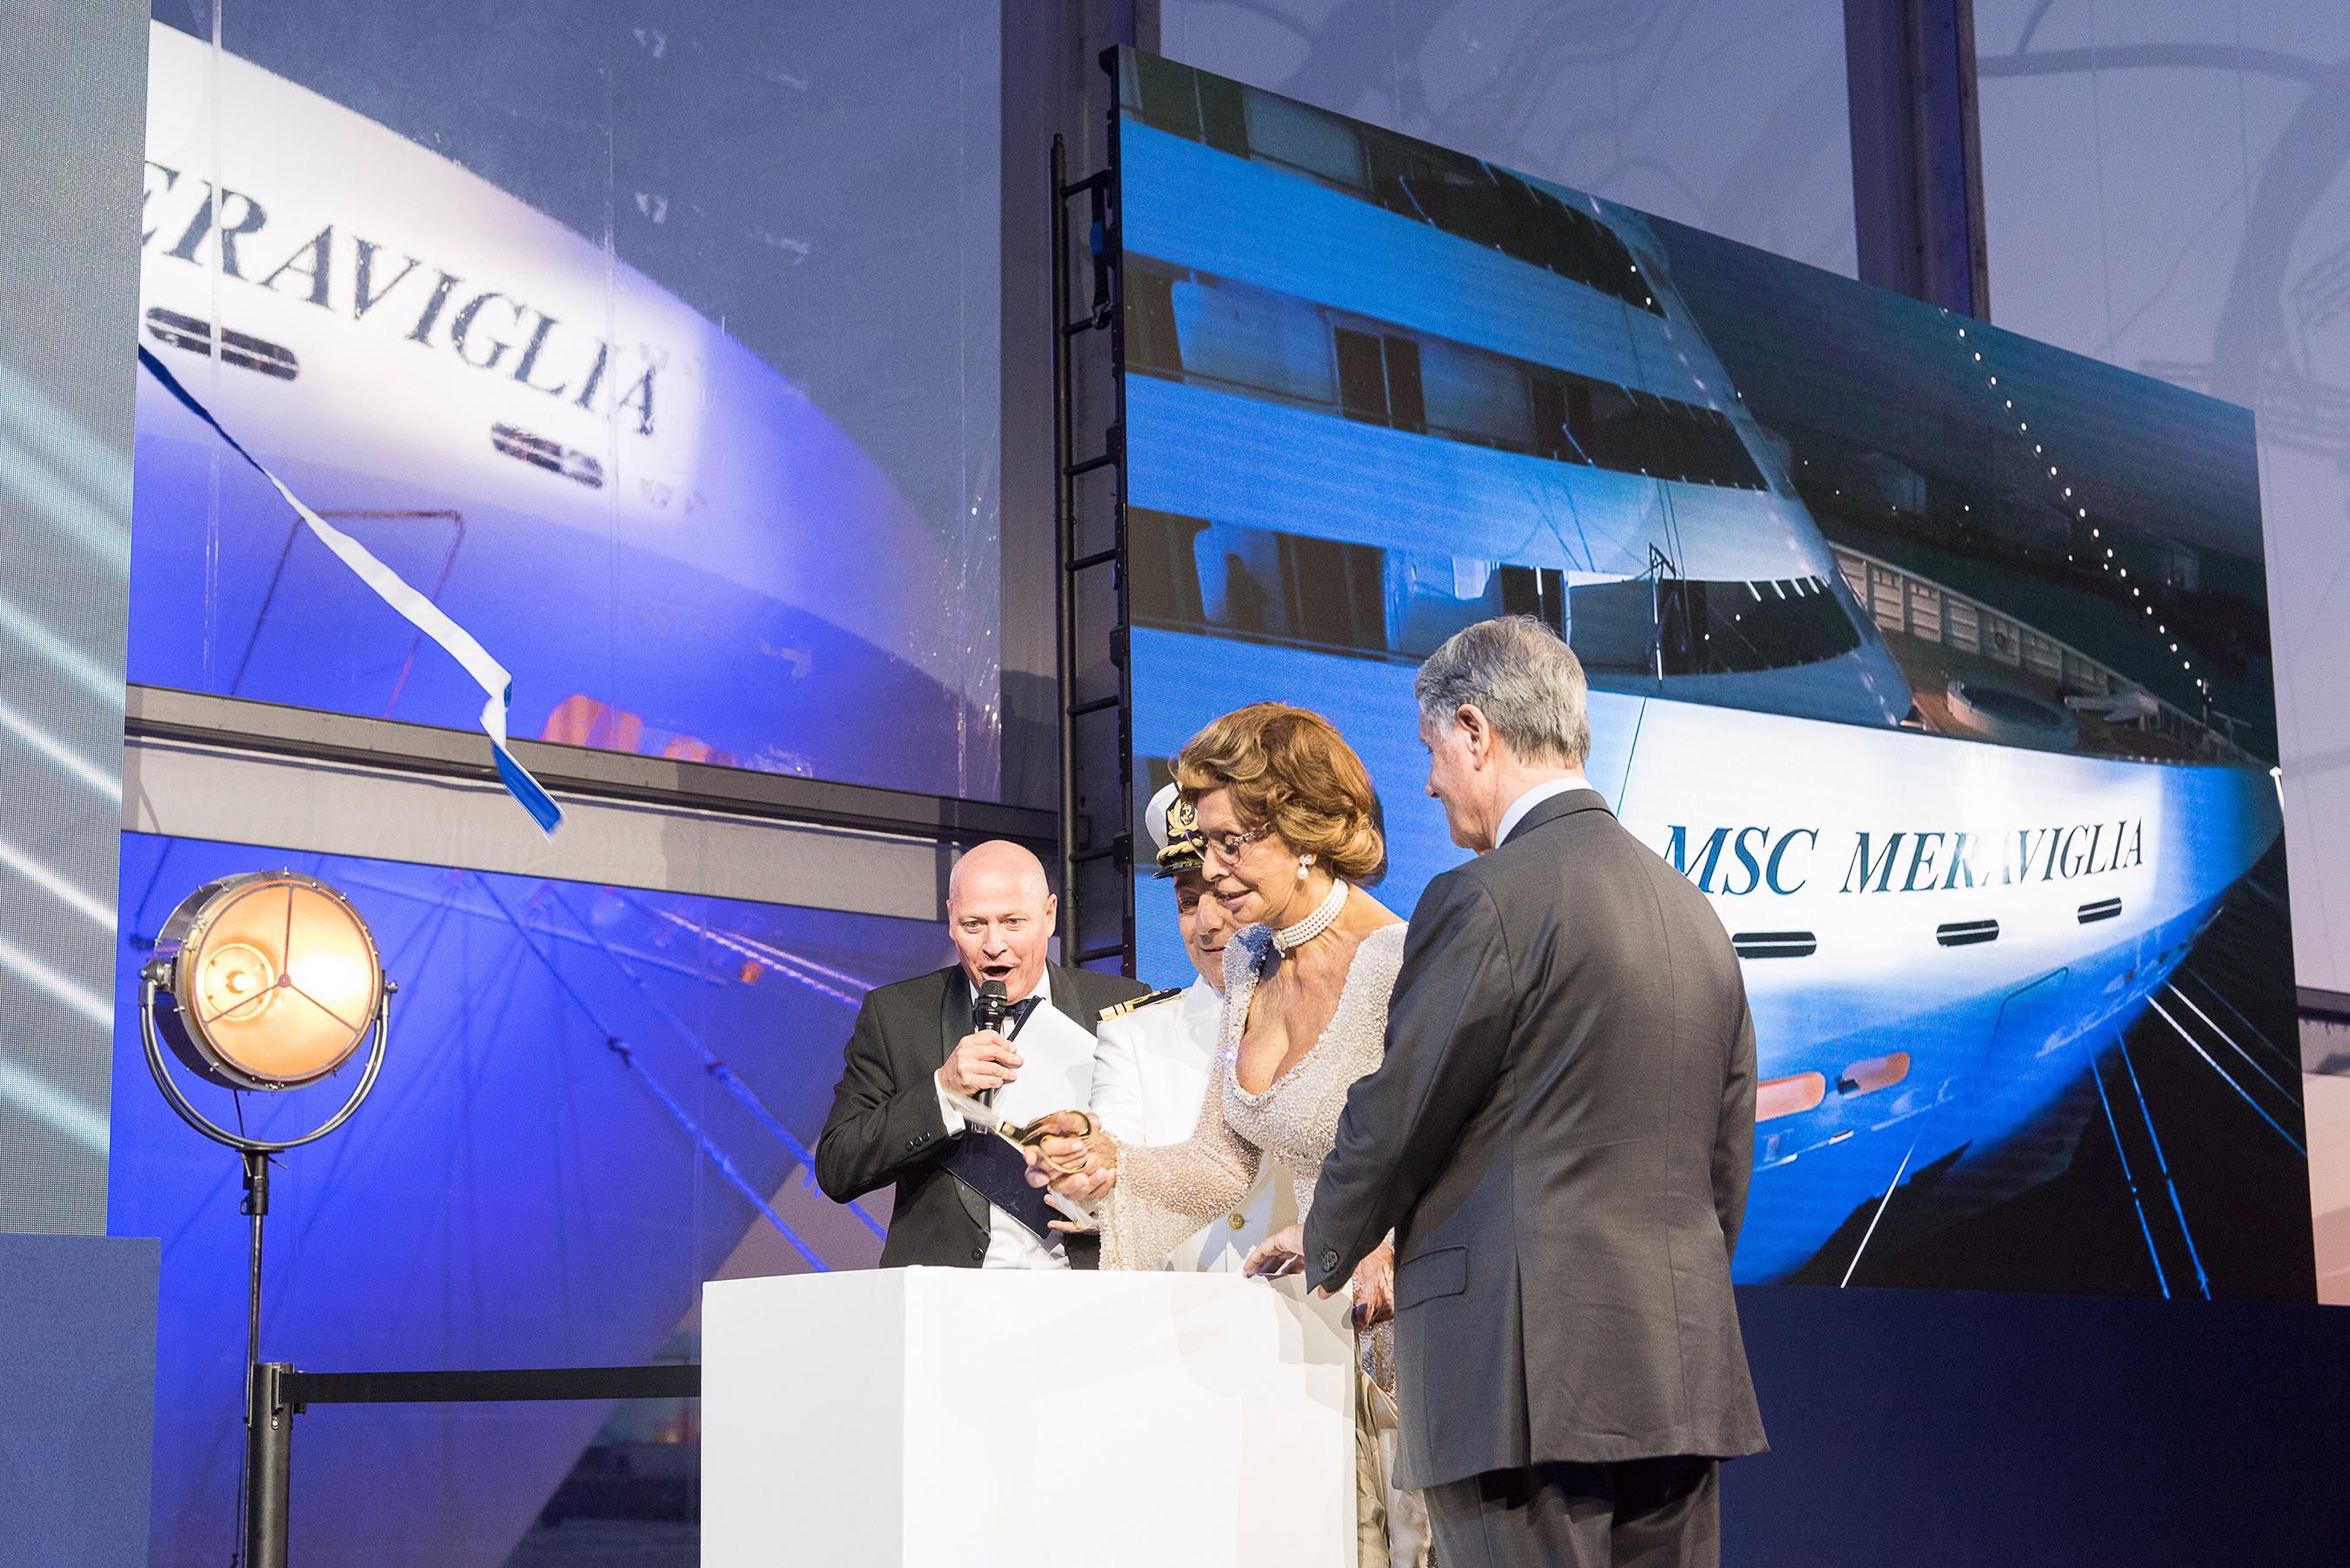 Godmother of all MSC Cruises ships, Sophia Loren, has the distinct honor of cutting the ribbon to christen MSC Meraviglia.